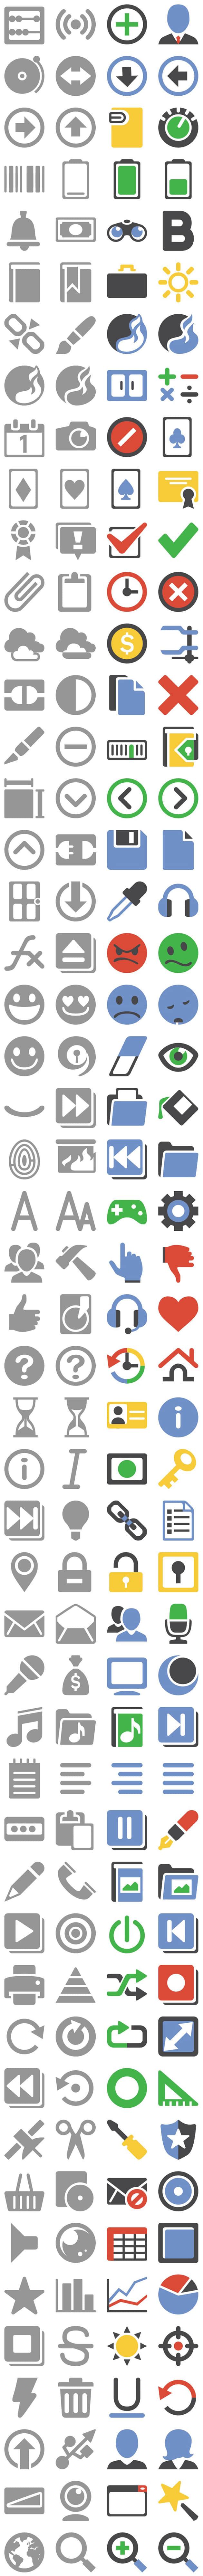 google-interface-icons-big_main